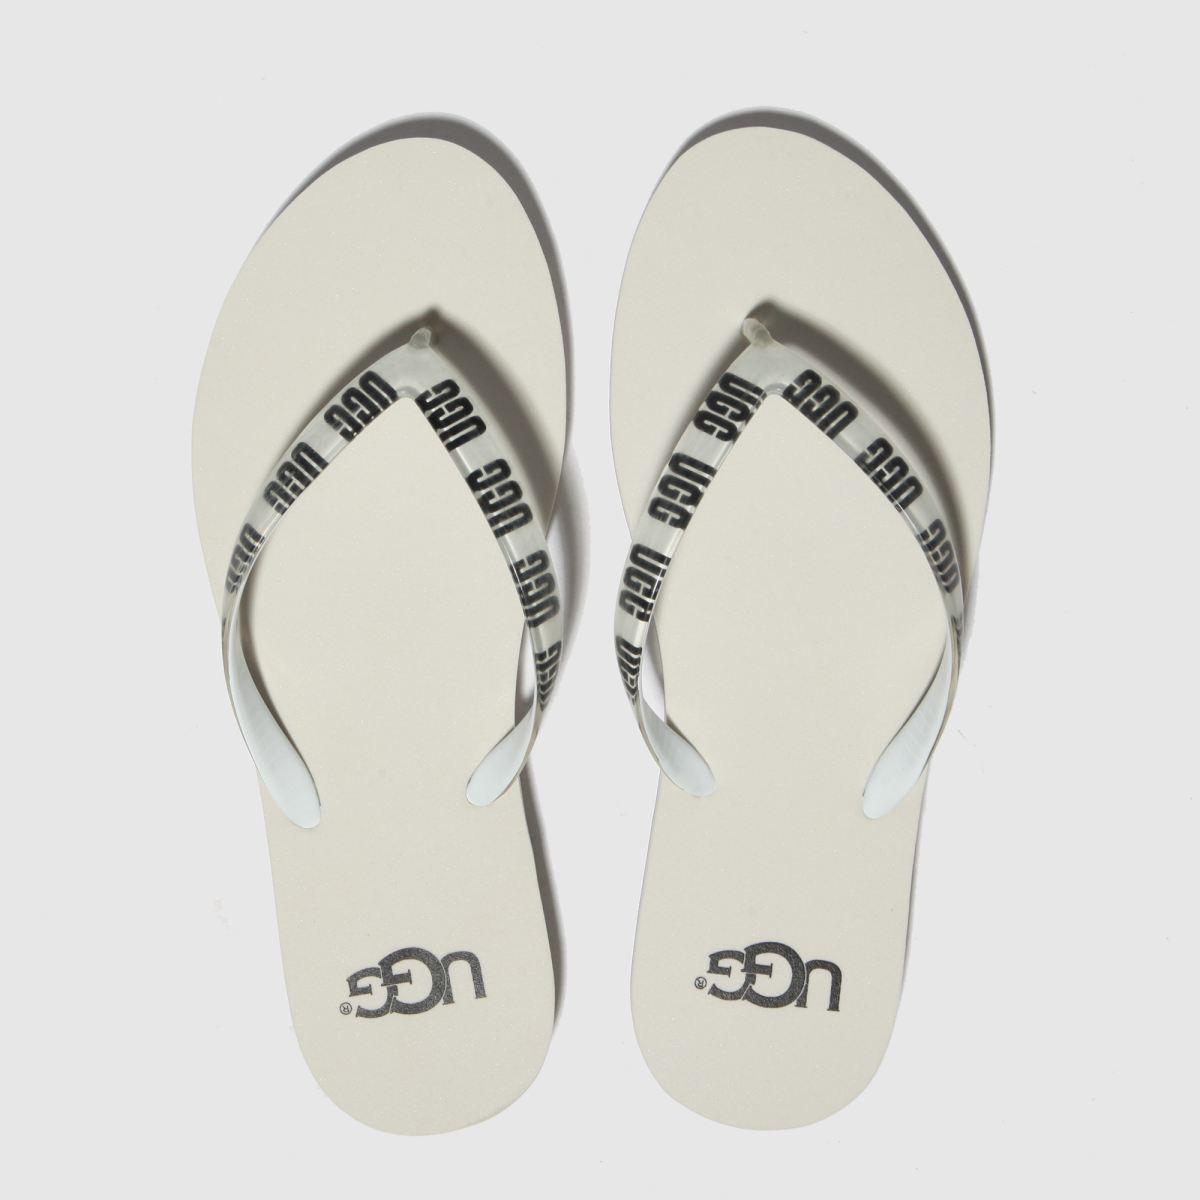 Ugg White & Black Simi Graphic Sandals